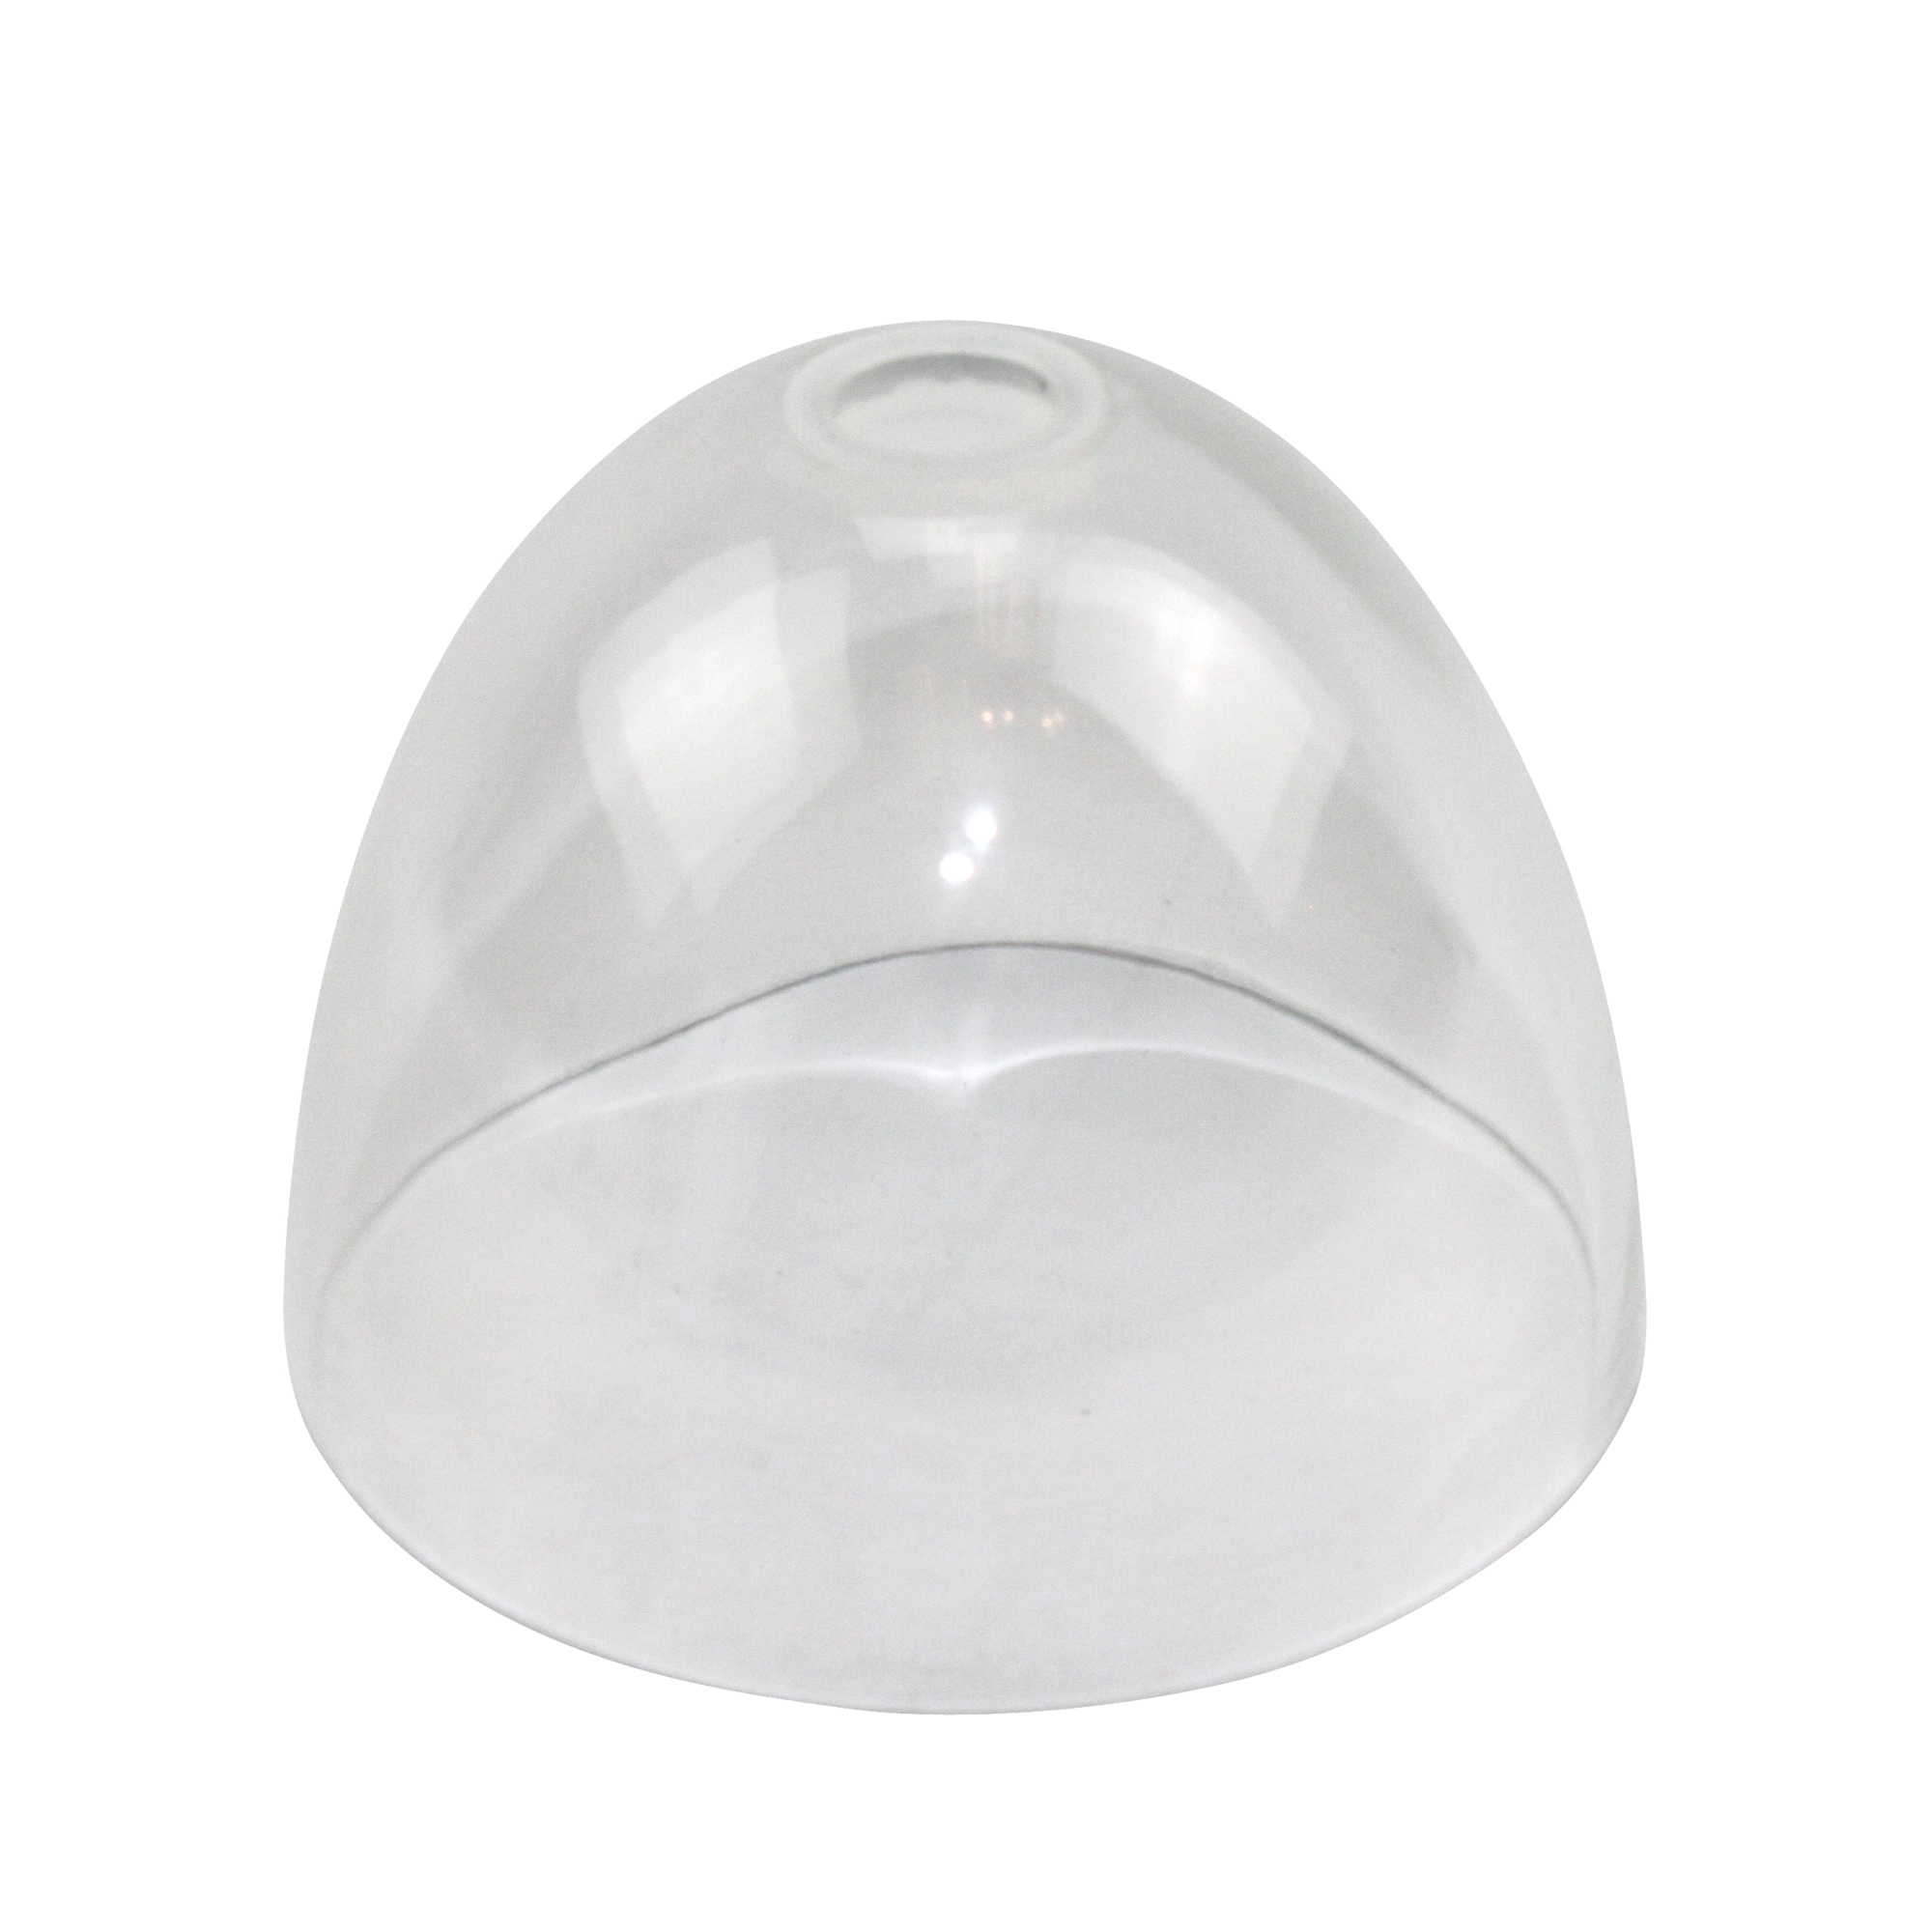 juno alfa g35 cl clear handblown glass cone shade. Black Bedroom Furniture Sets. Home Design Ideas